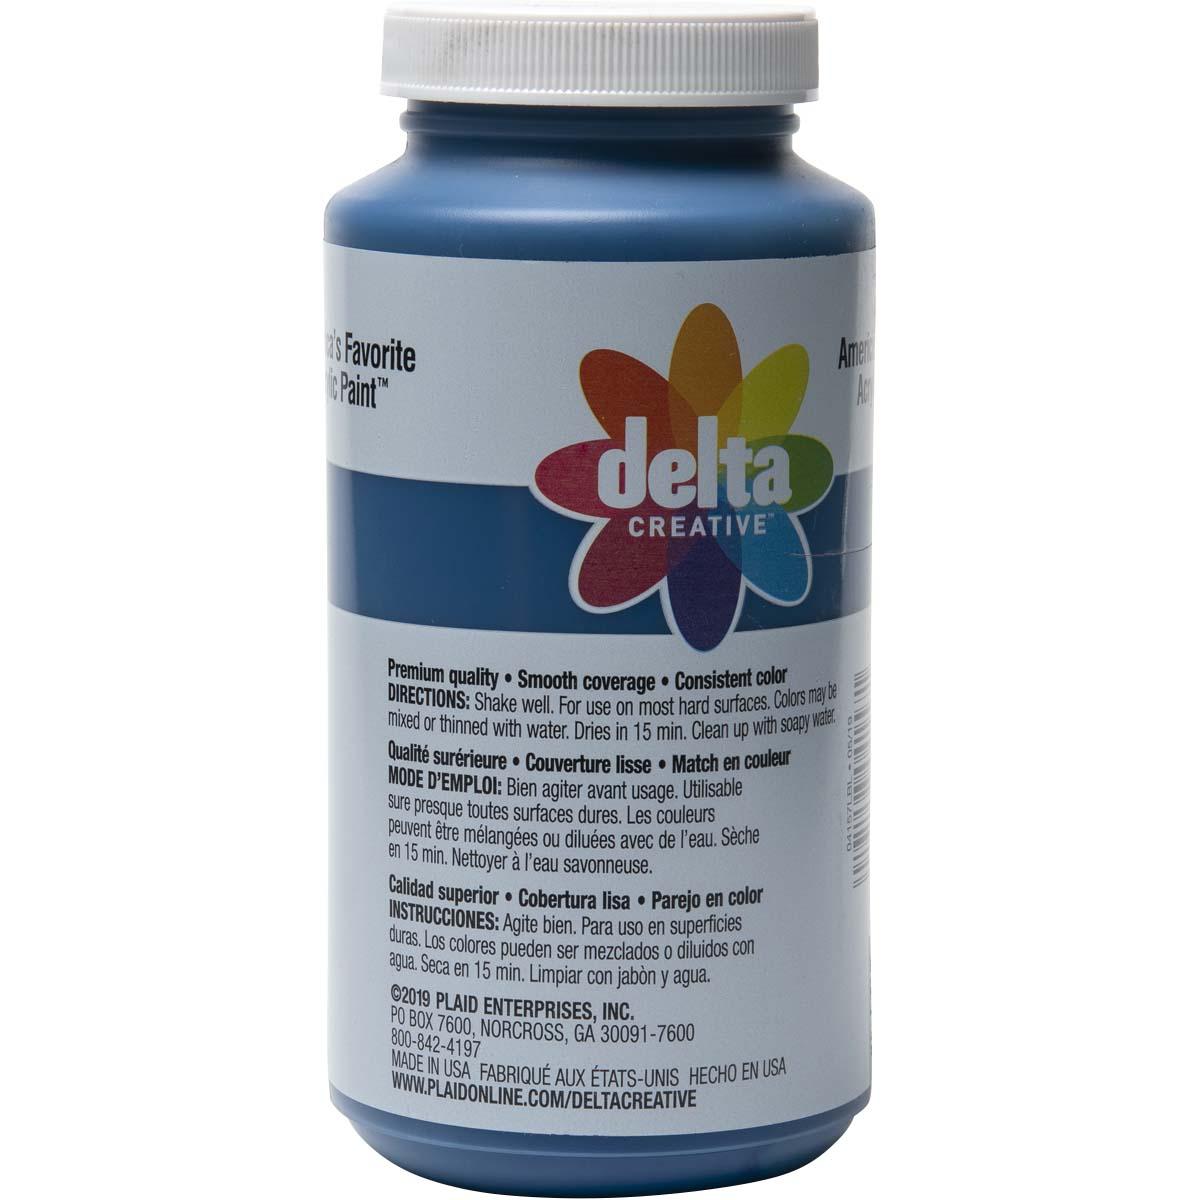 Delta Ceramcoat ® Acrylic Paint - Navy Blue, 16 oz.